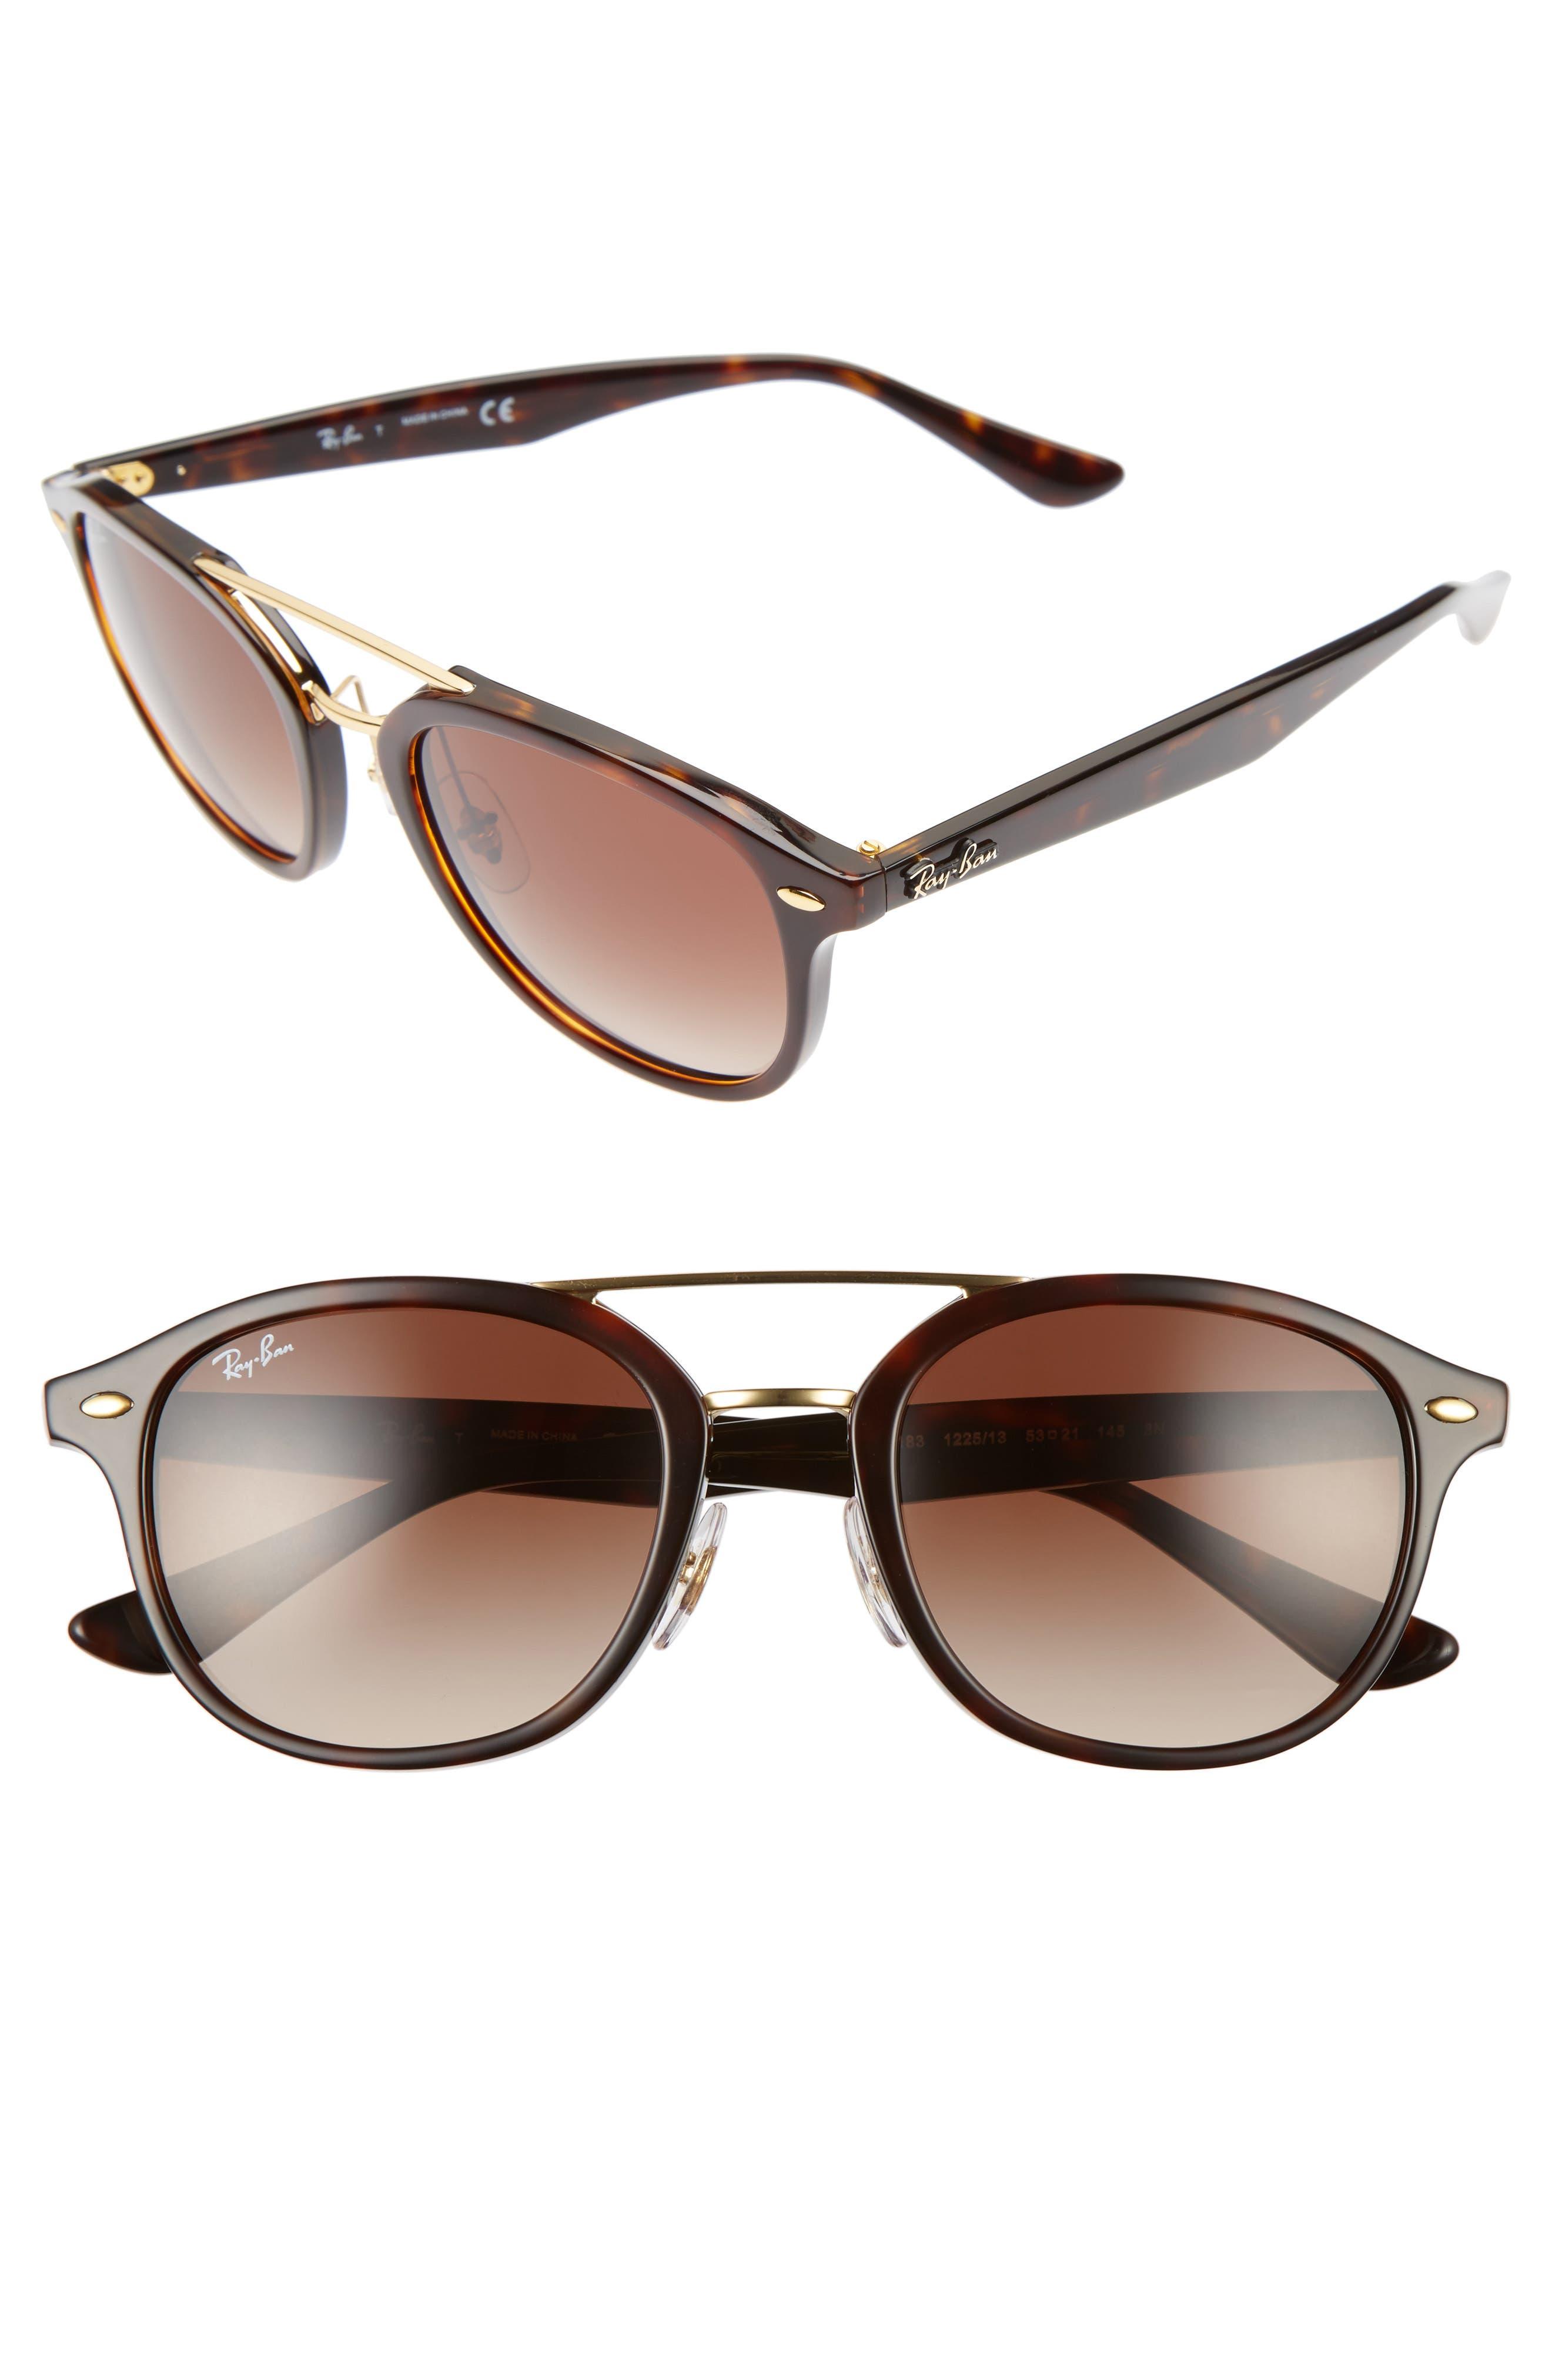 53mm Aviator Sunglasses,                         Main,                         color, 905